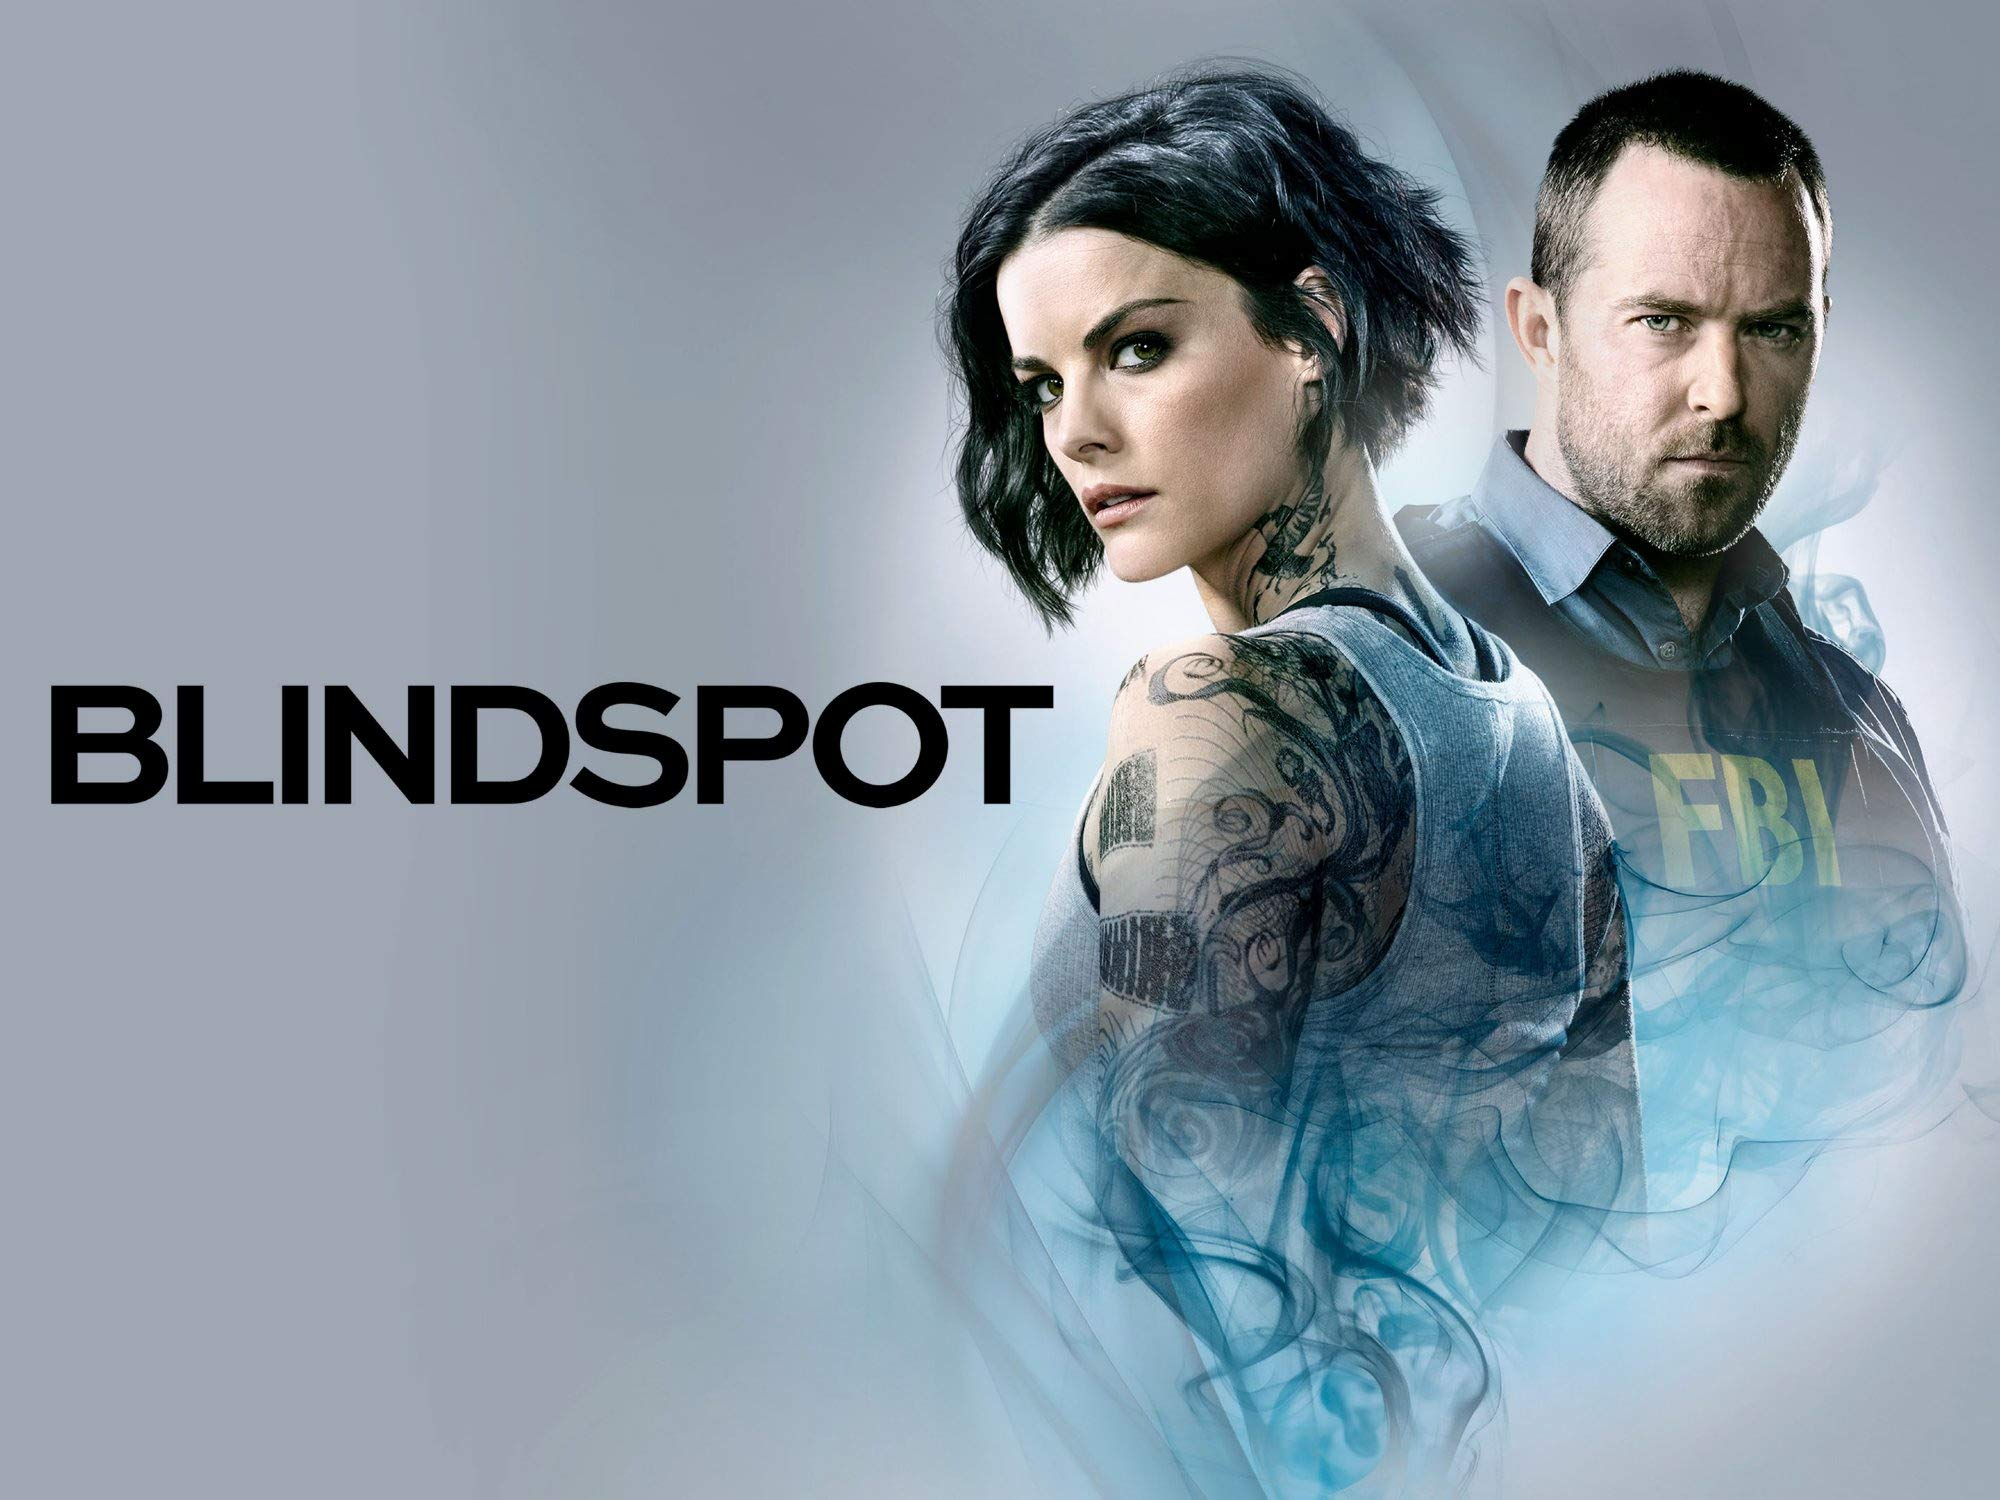 blindspot season 1 episode 23 watch online free